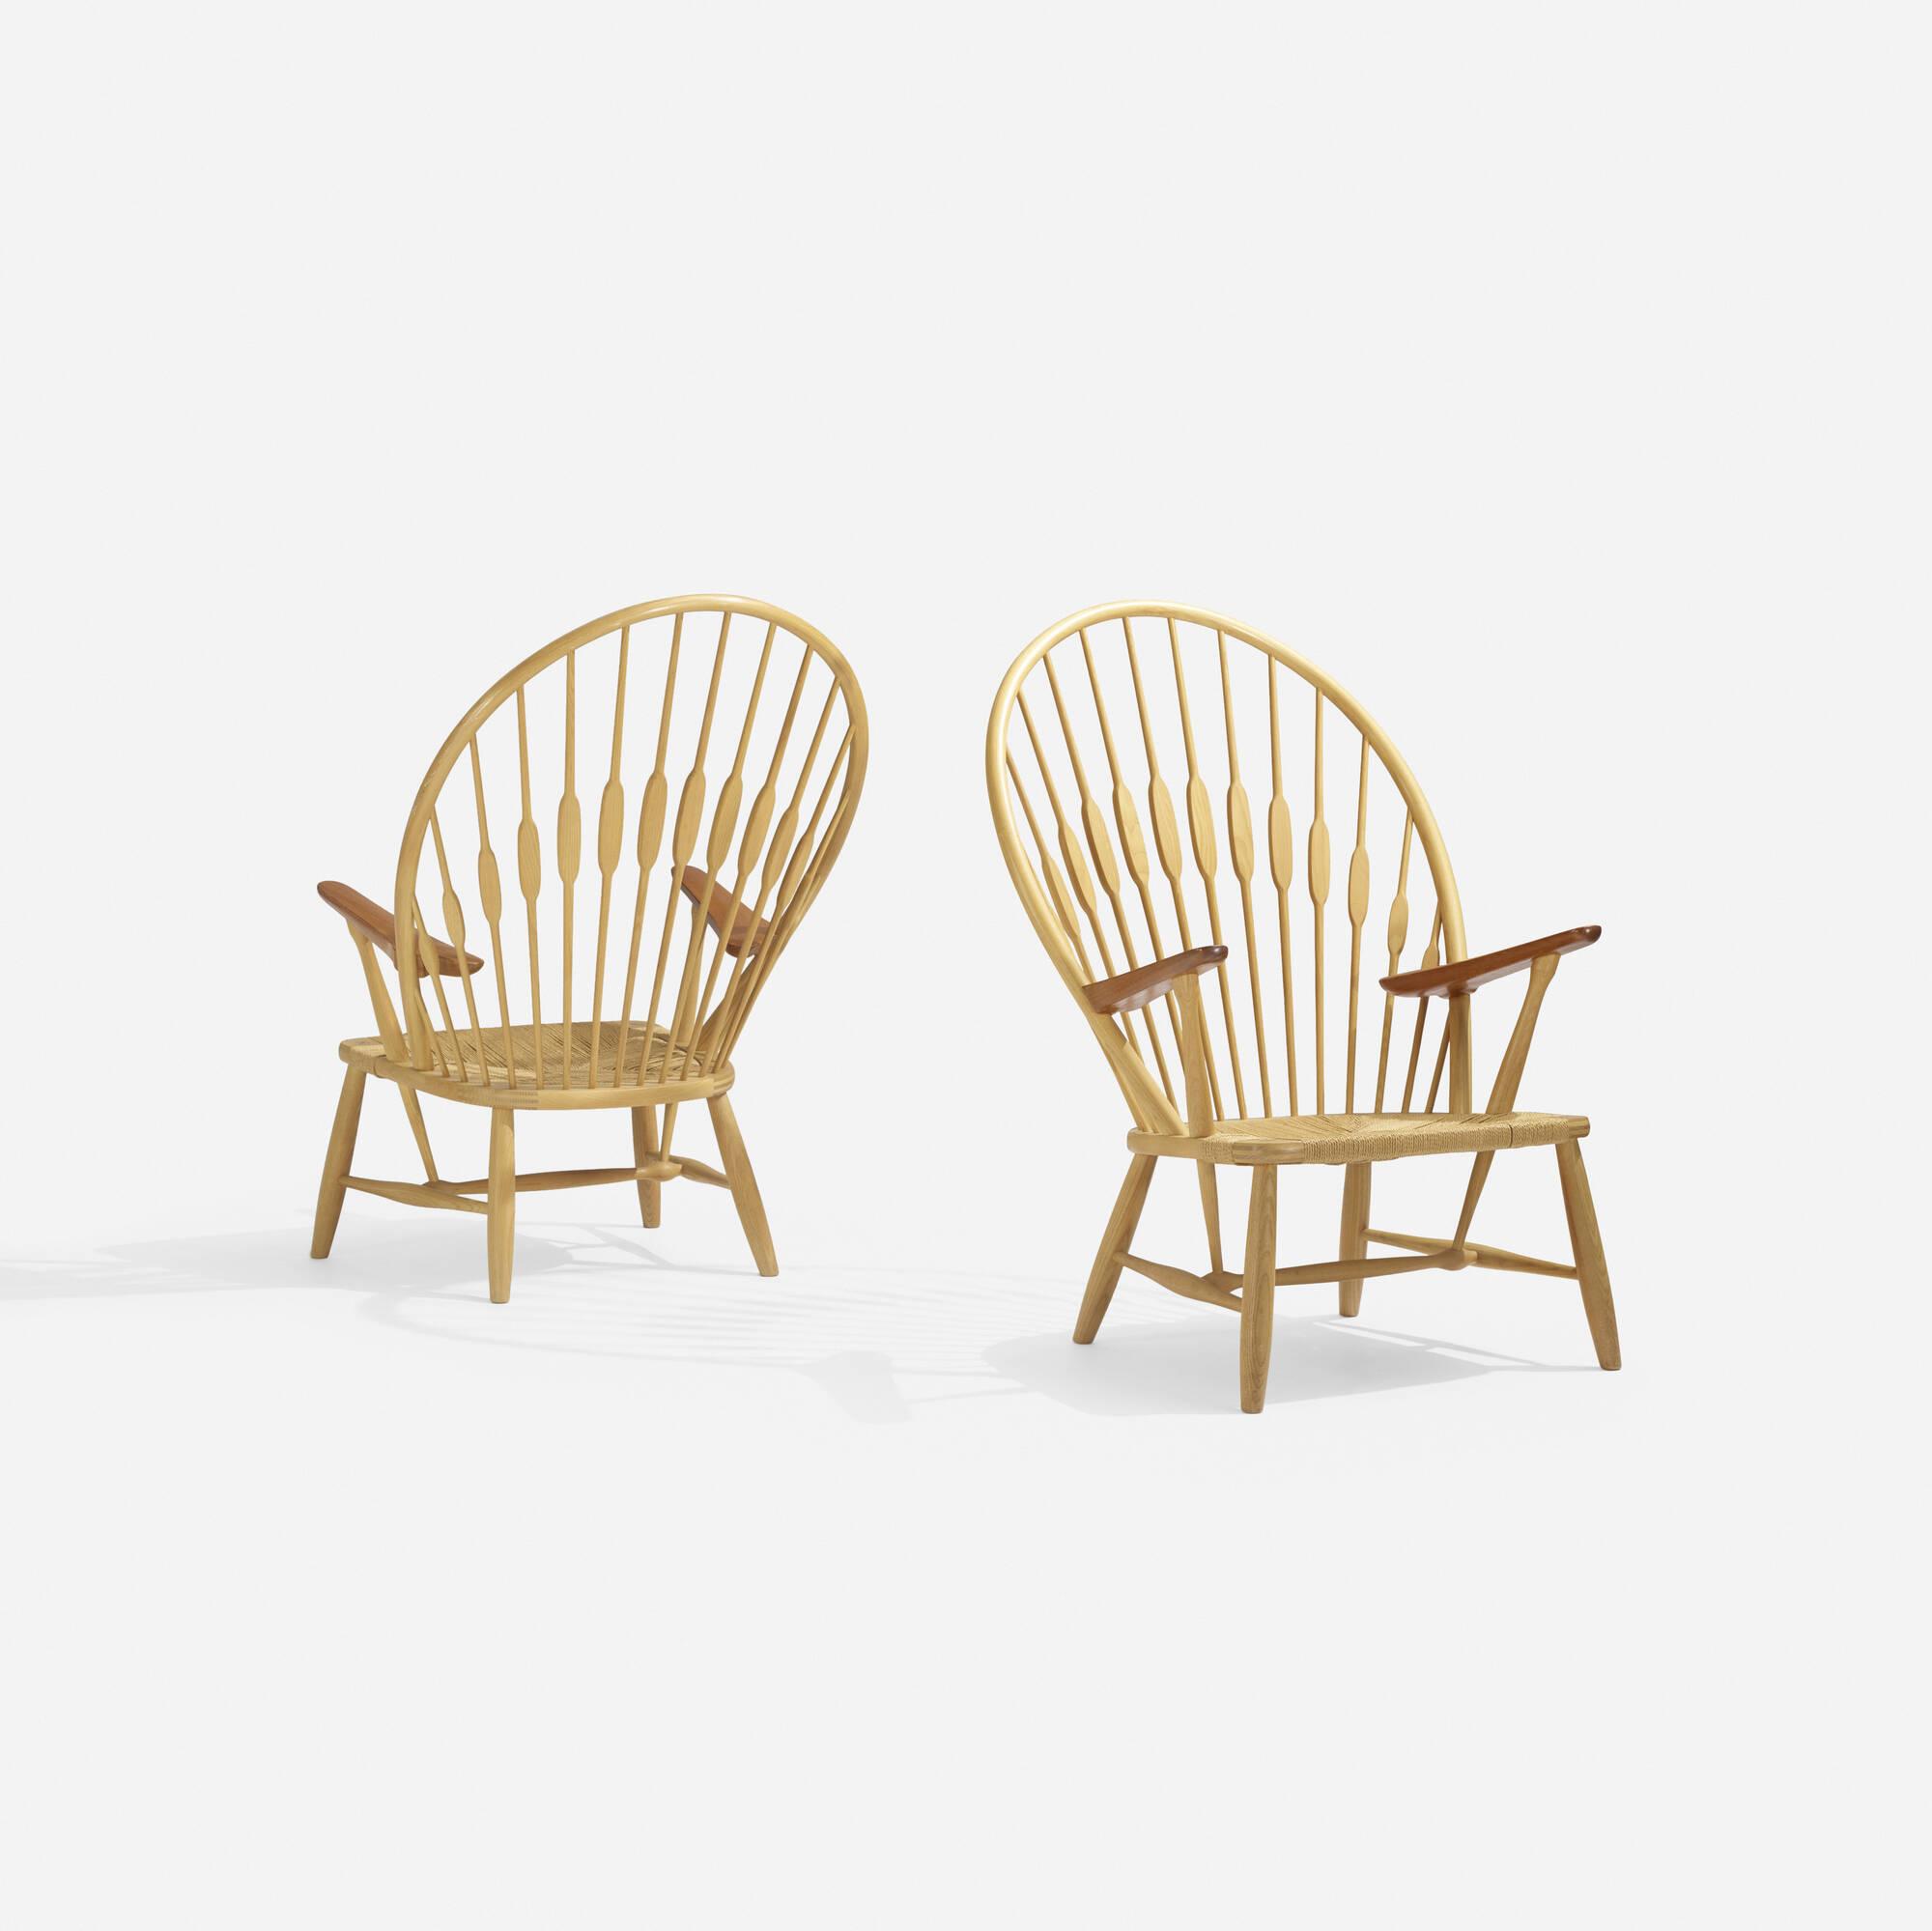 297: Hans J. Wegner / Peacock chairs, pair (2 of 4)